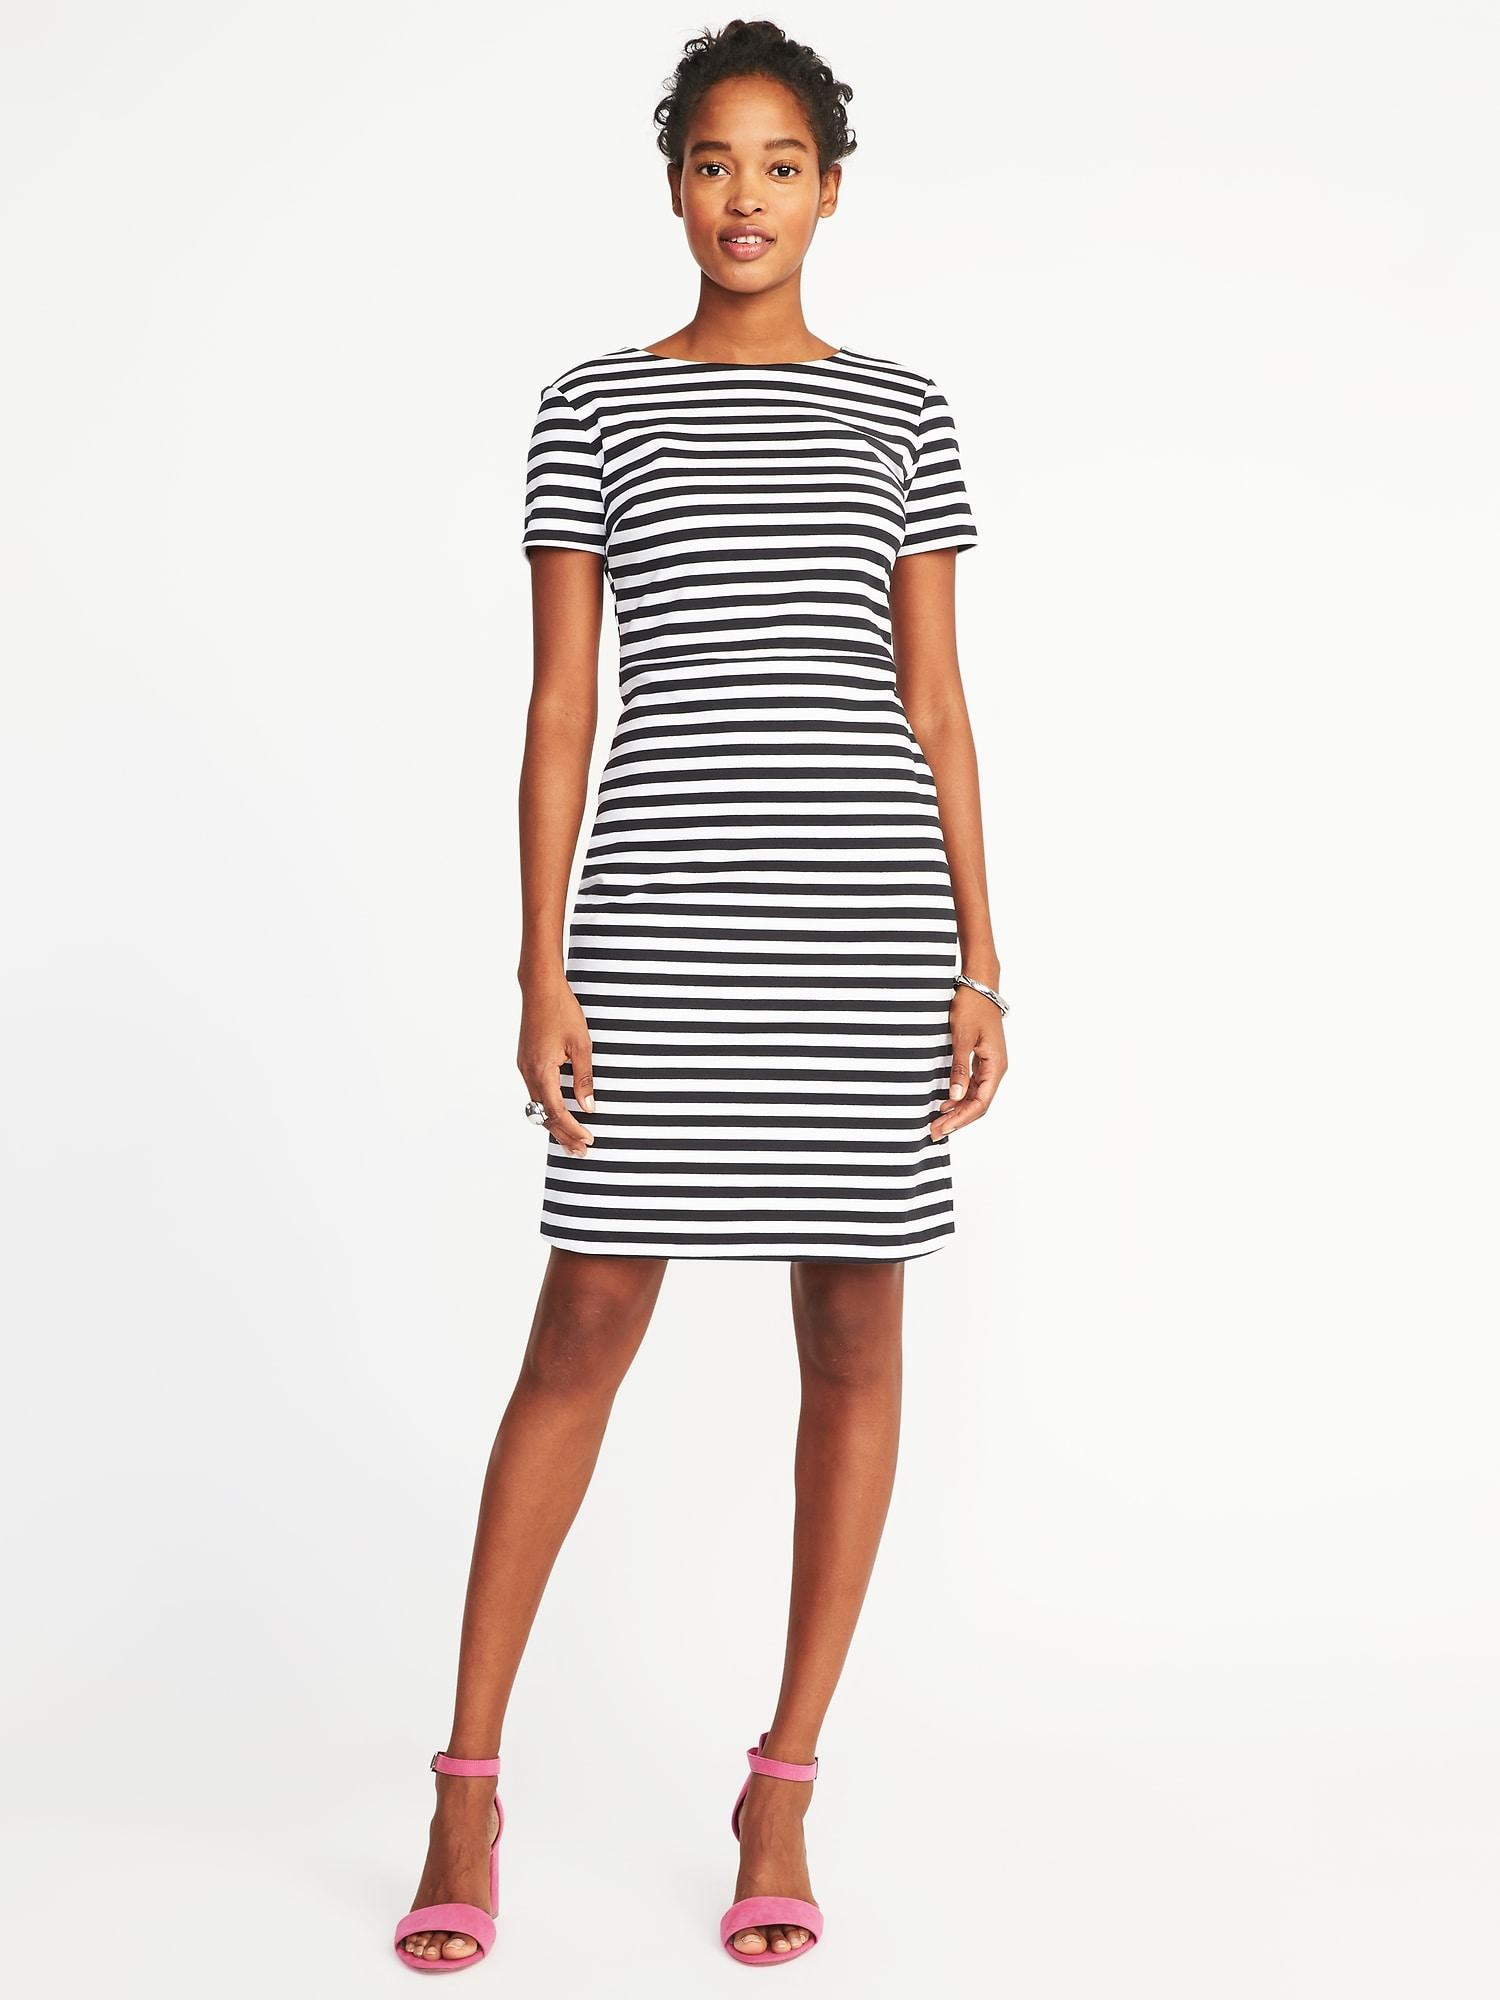 b7185841a2ca71 Ponte-Knit Sheath Dress for Women